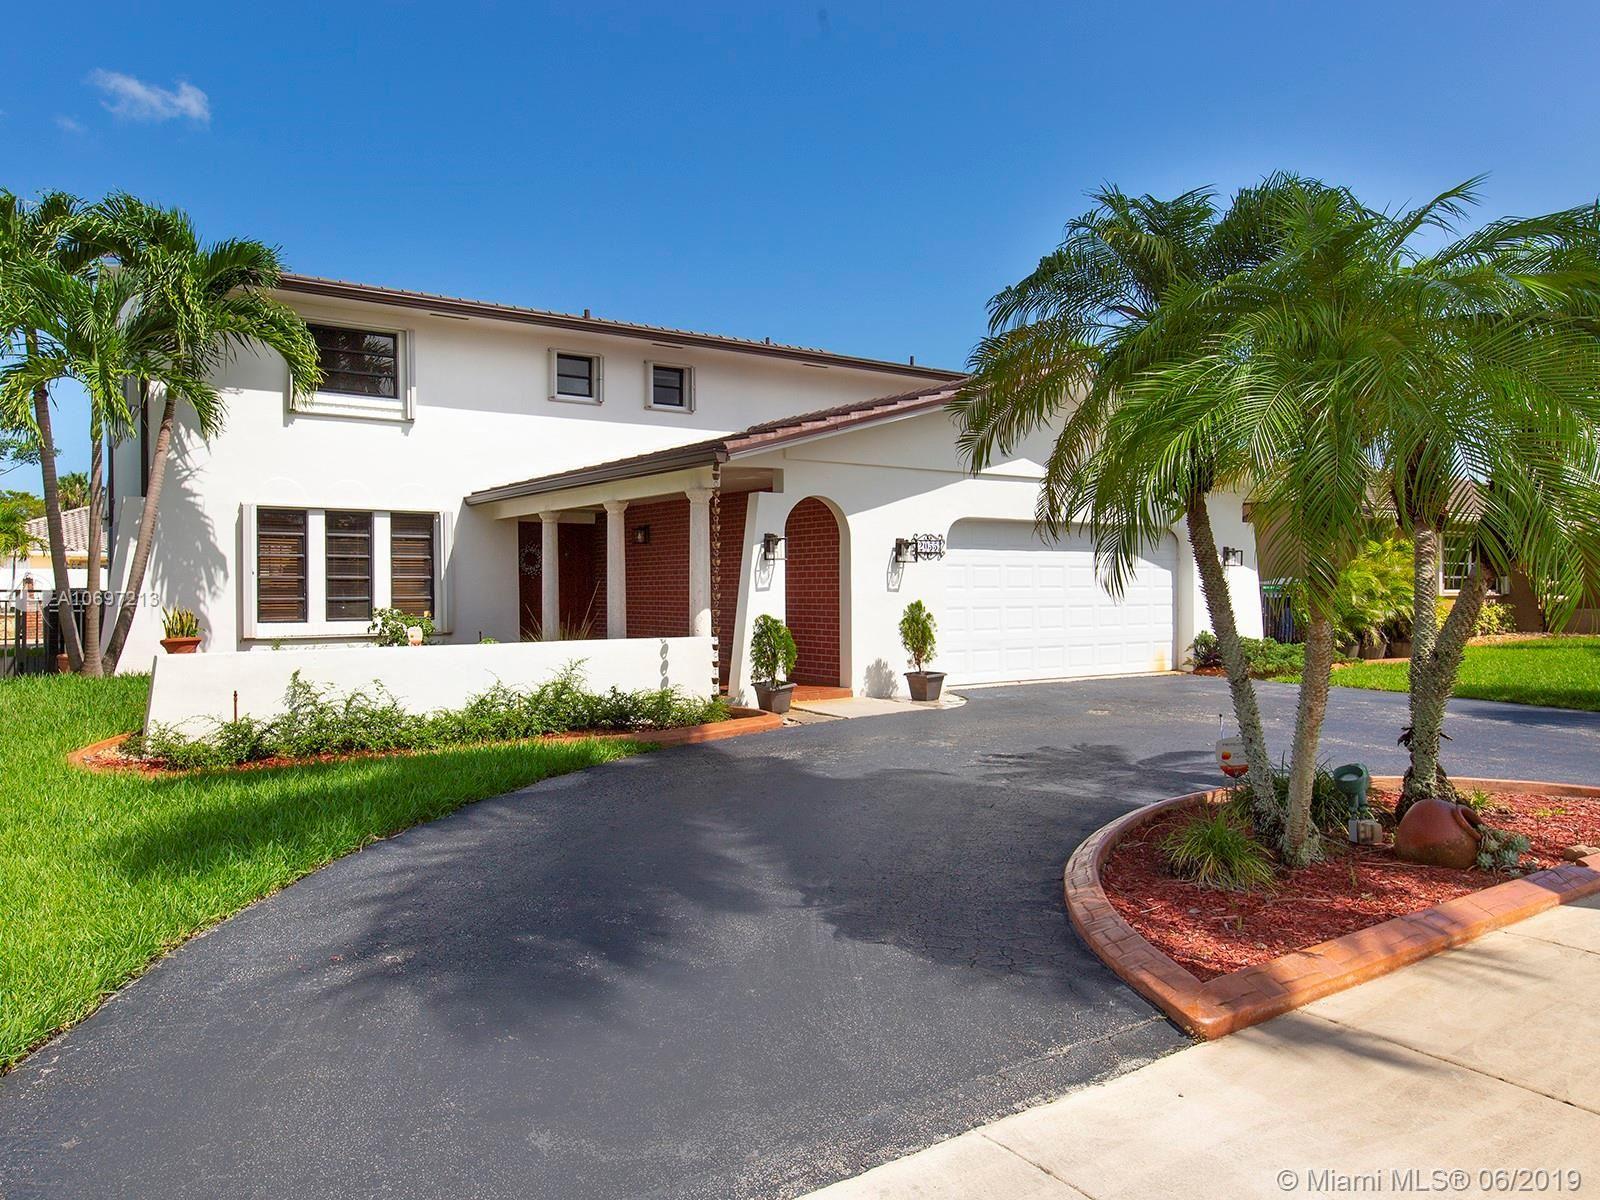 2055 SW 123rd Ct, Miami, FL 33175 - MLS#: A10697213